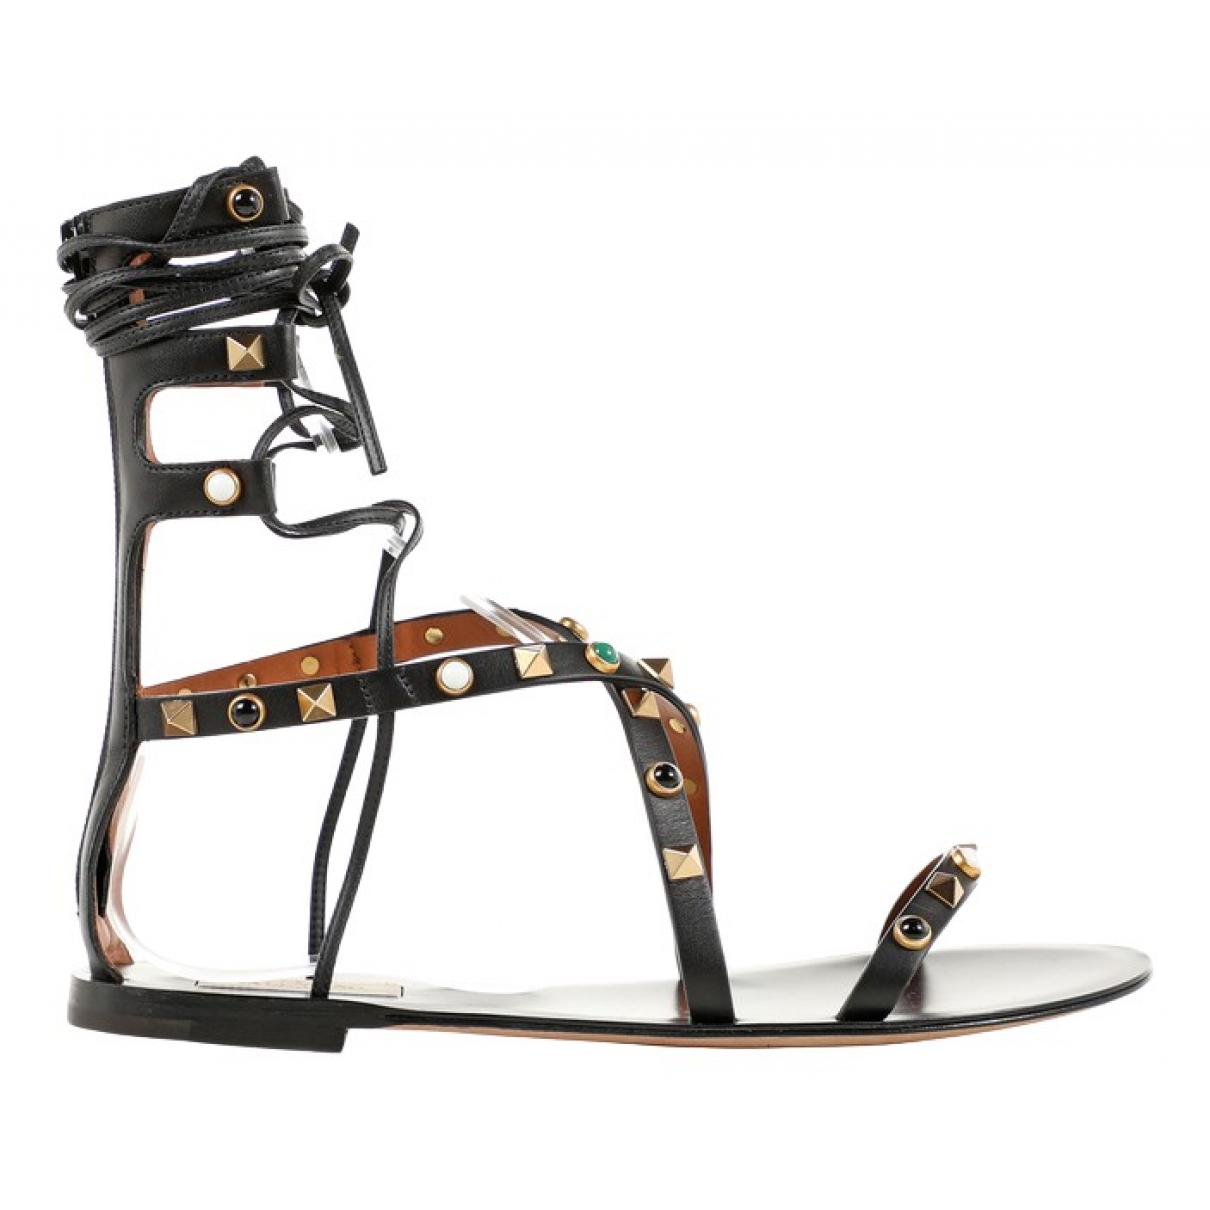 Valentino Garavani Rockstud Black Leather Sandals for Women 37.5 EU